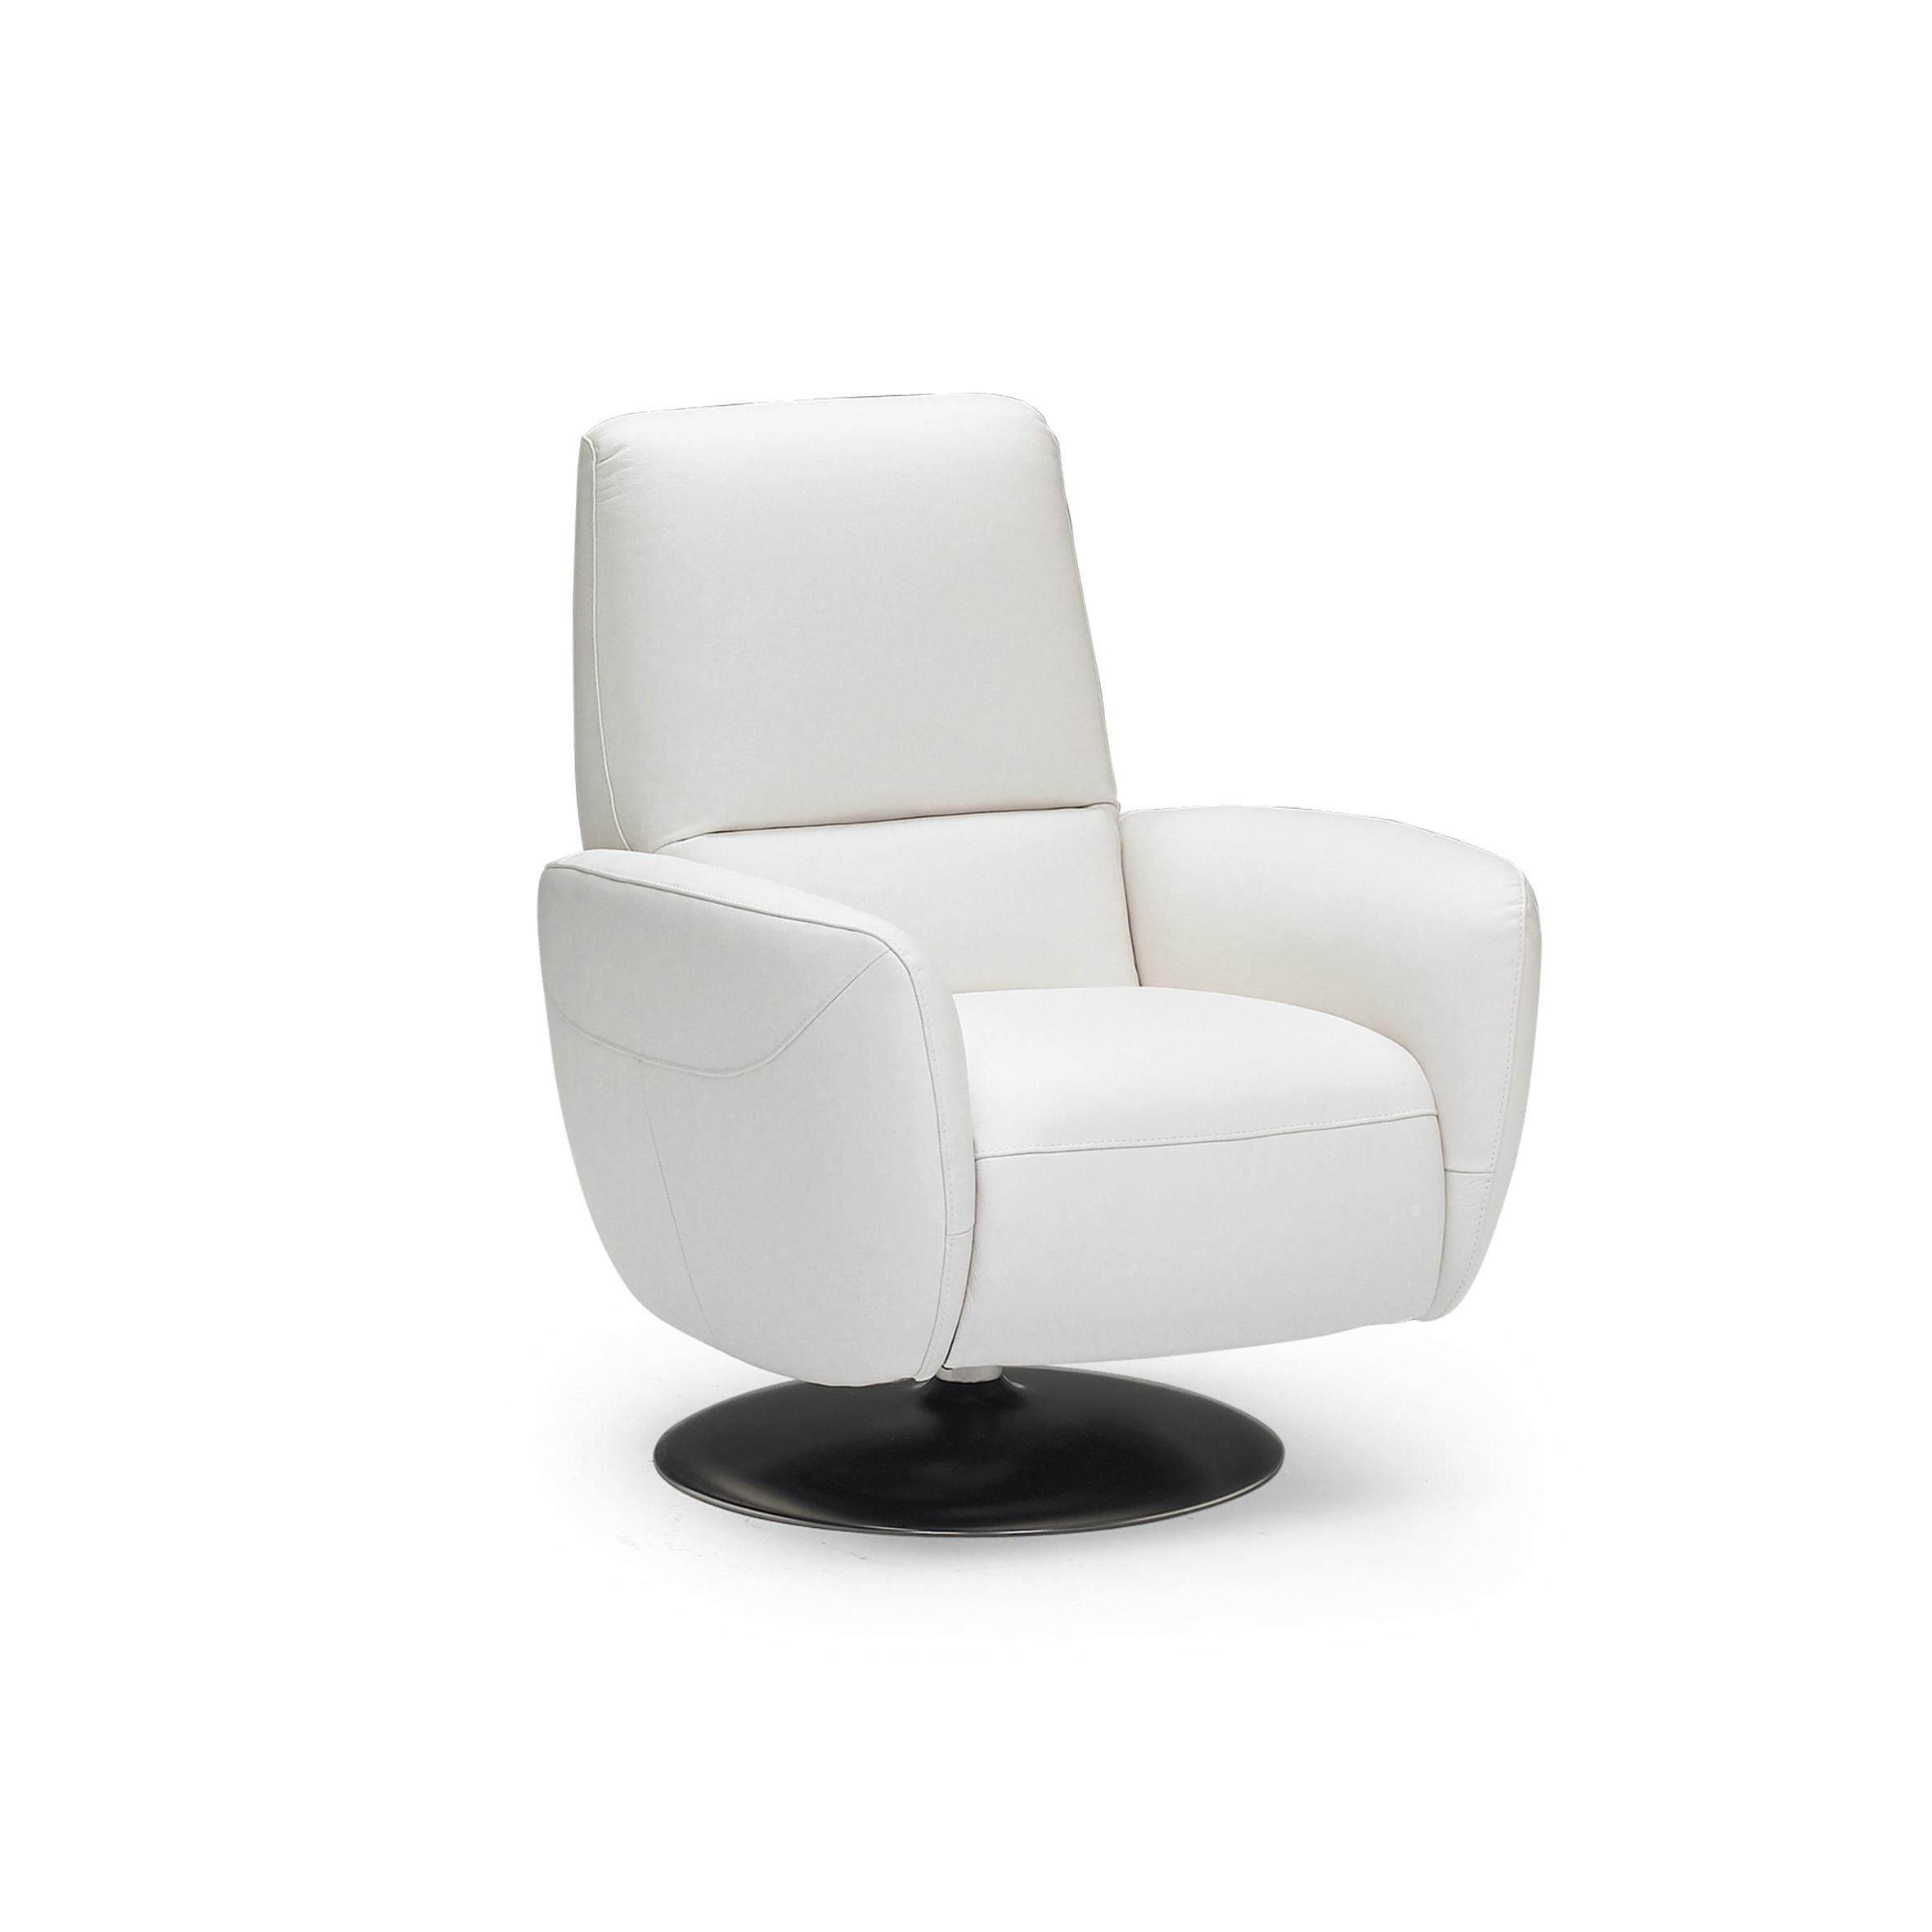 natuzzi swivel chair princess upholstered italia genny reclining